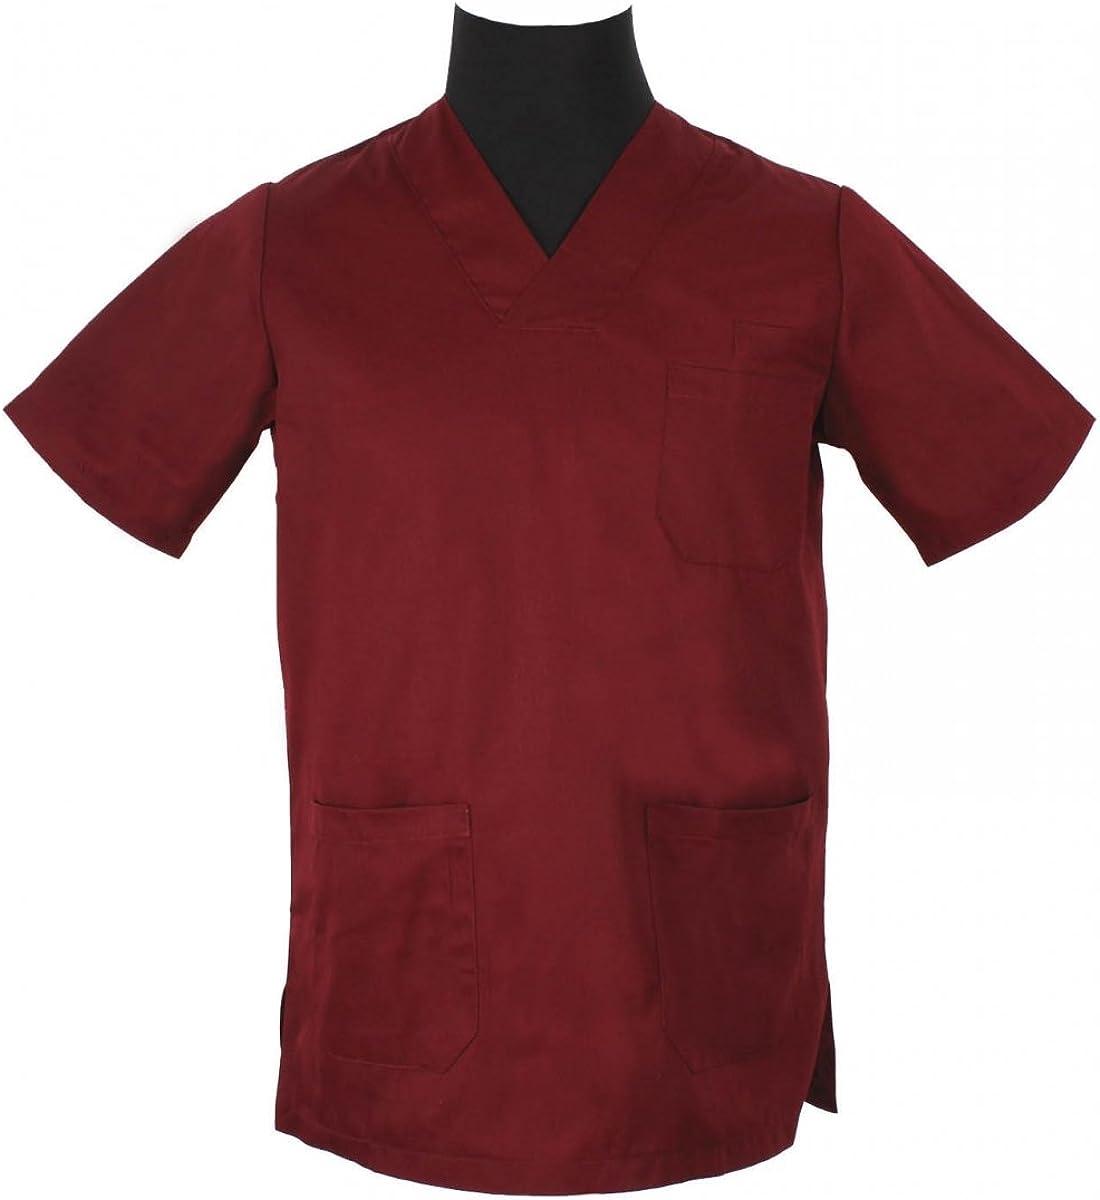 Misemiya Uniforms Unisexe T-Shirt de Service m/édical Mixte